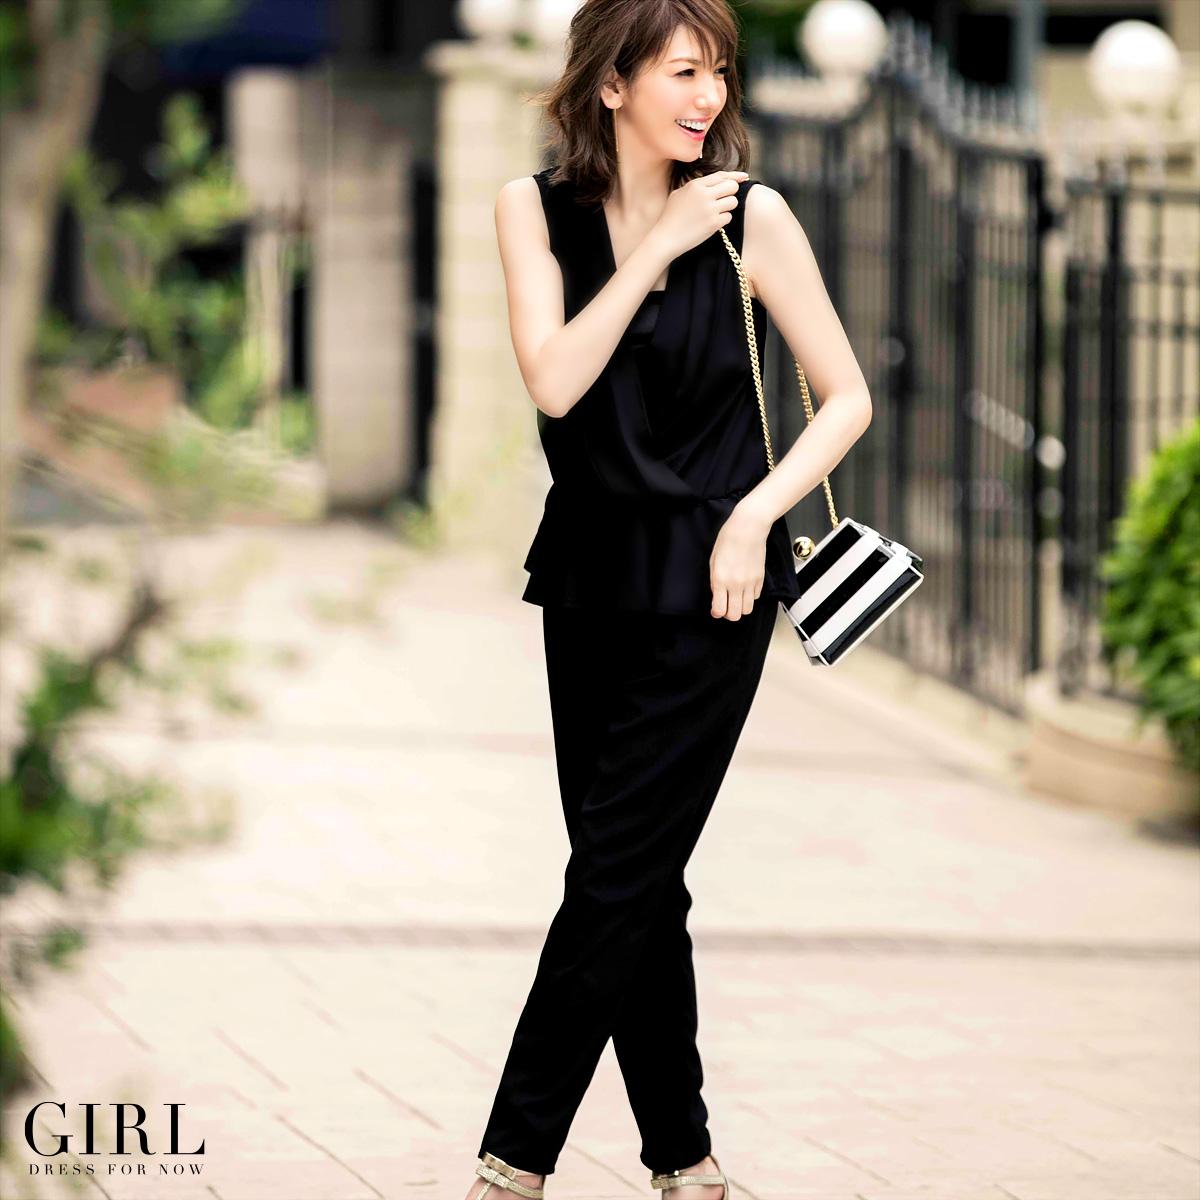 Dress shop GIRL   Rakuten Global Market: Party dress pants dress one ...